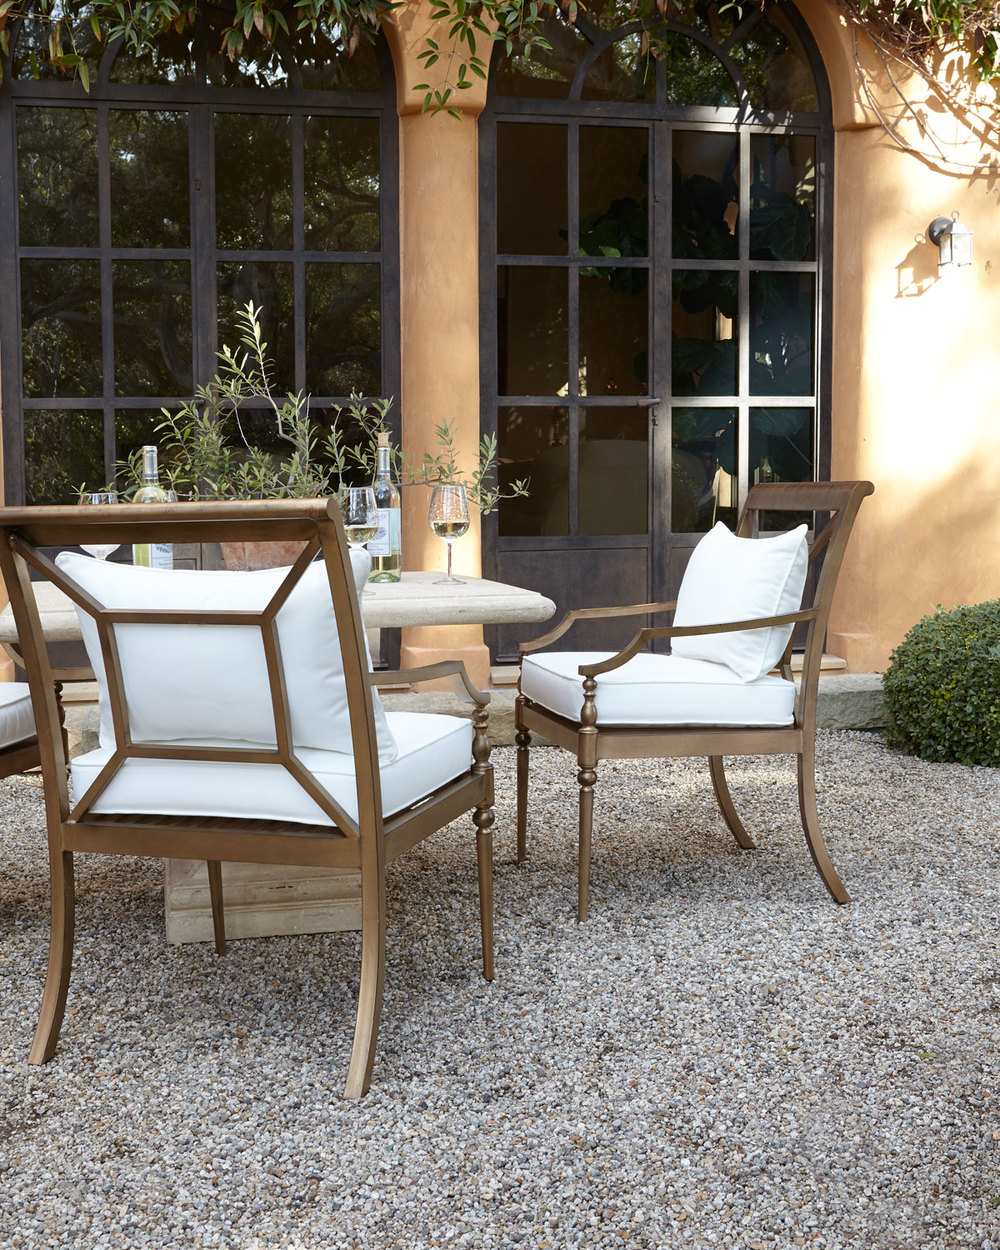 Outdoor glamour springtime patio inspiration franki for Outdoor patio inspiration